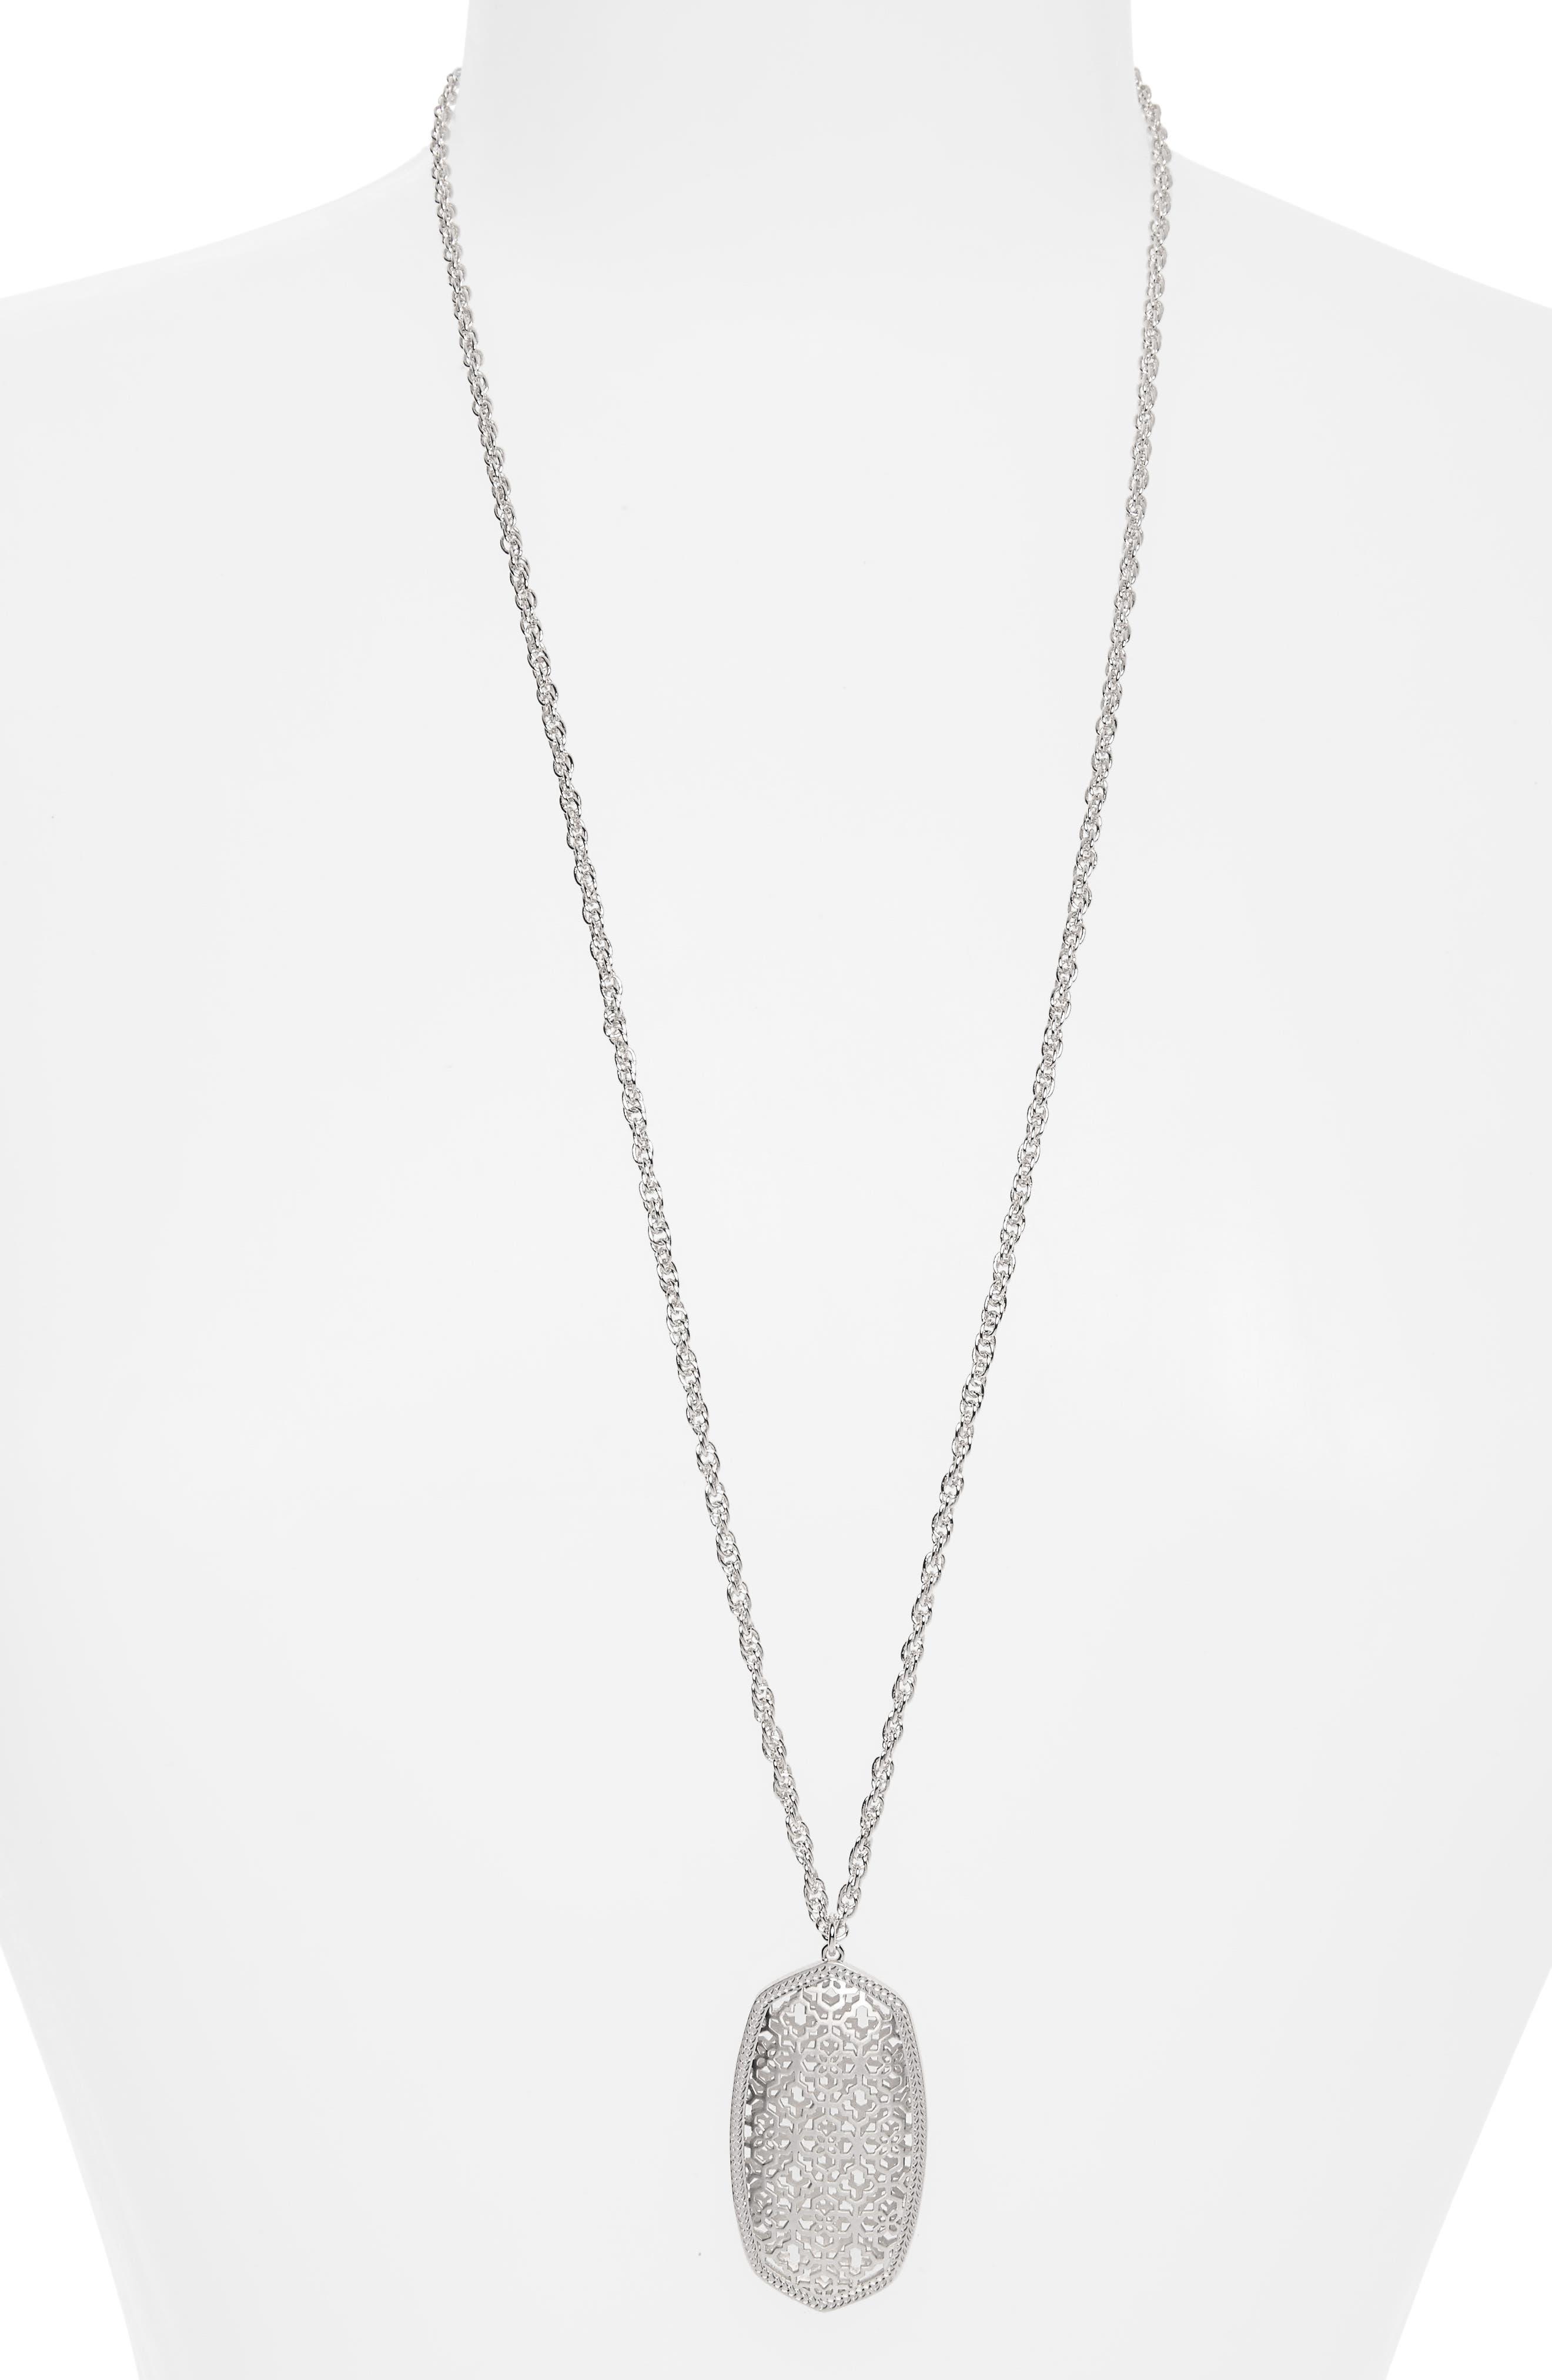 KENDRA SCOTT Rae Long Filigree Pendant Necklace, Main, color, SILVER FILIGREE